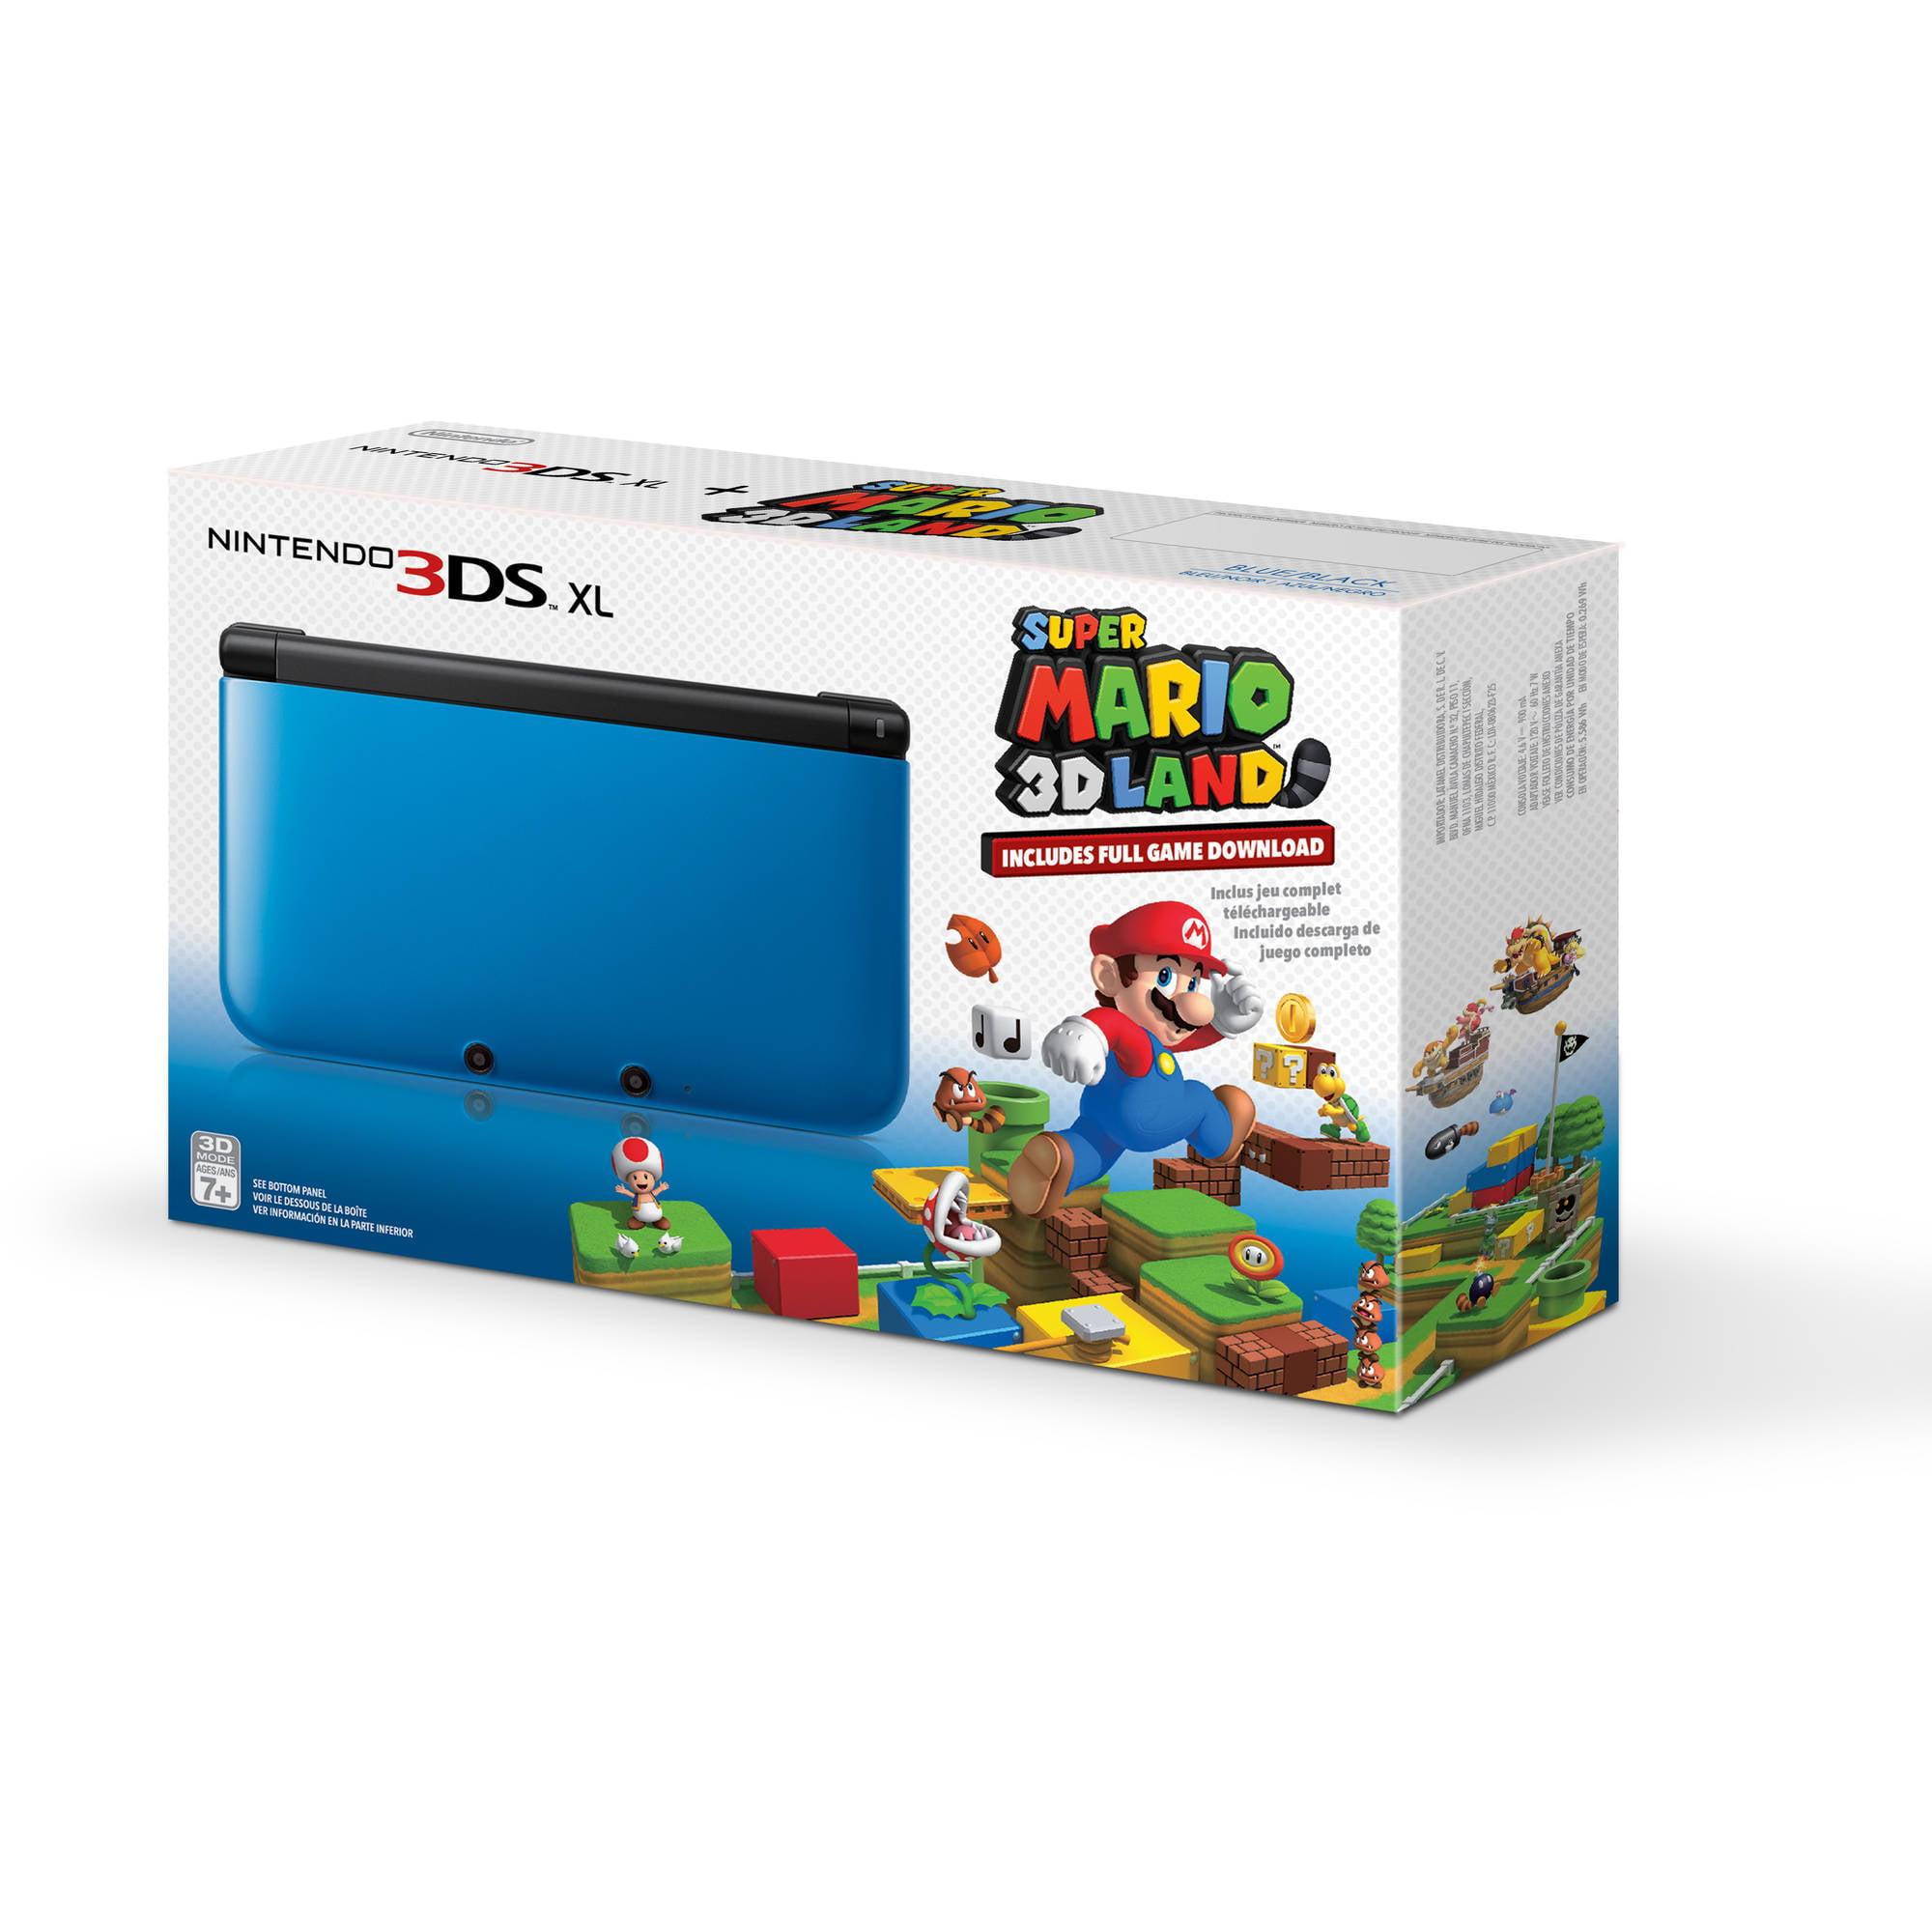 Nintendo 3ds Xl Handheld Console With Super Mario 3d Land Blue